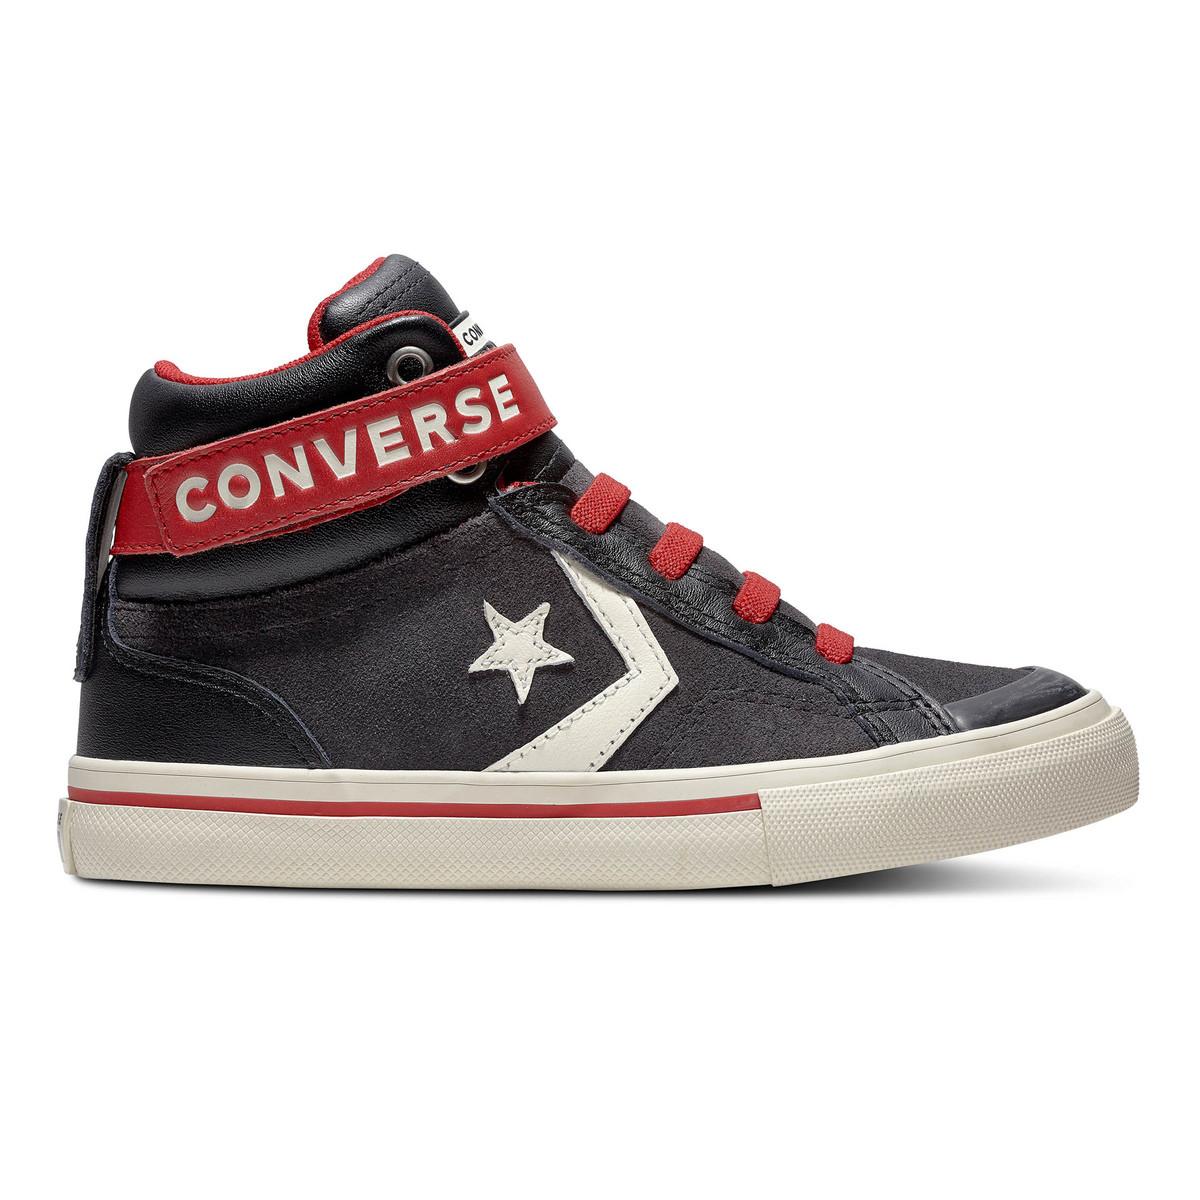 converse pro